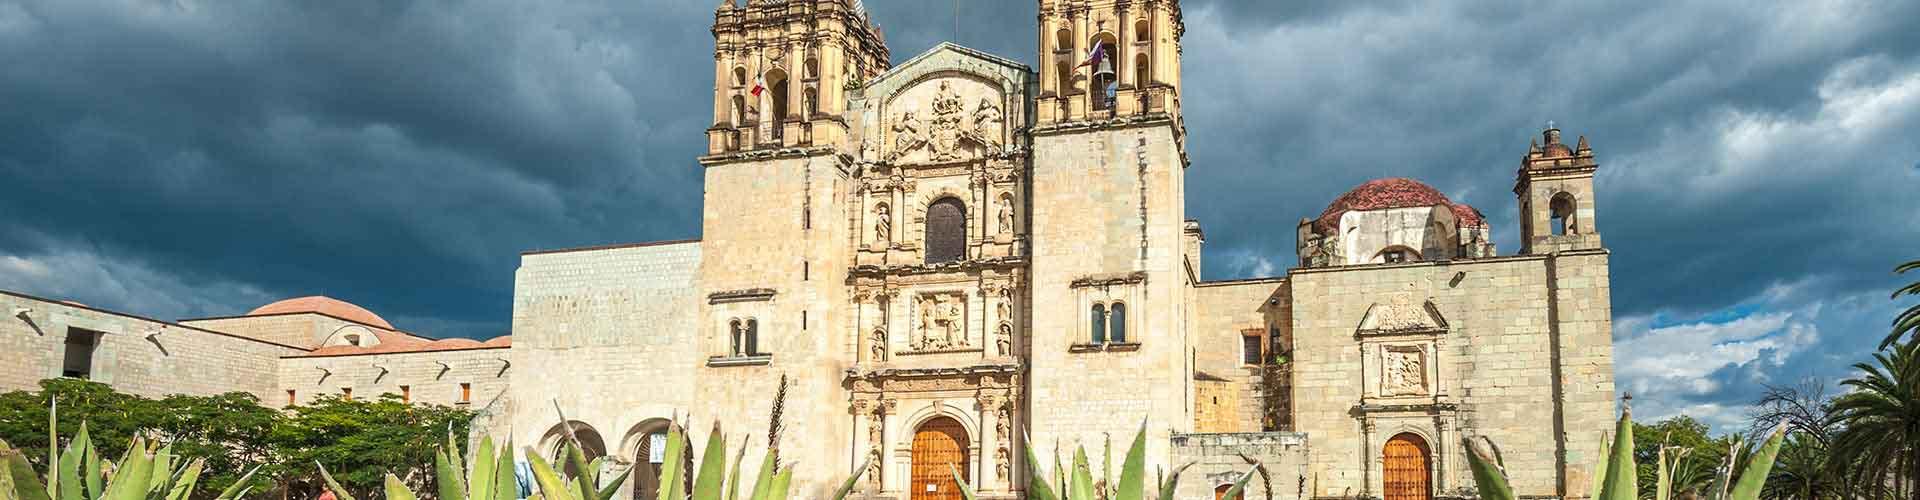 Oaxaca - Apartamentos en Oaxaca. Mapas de Oaxaca, Fotos y comentarios de cada Apartamento en Oaxaca.